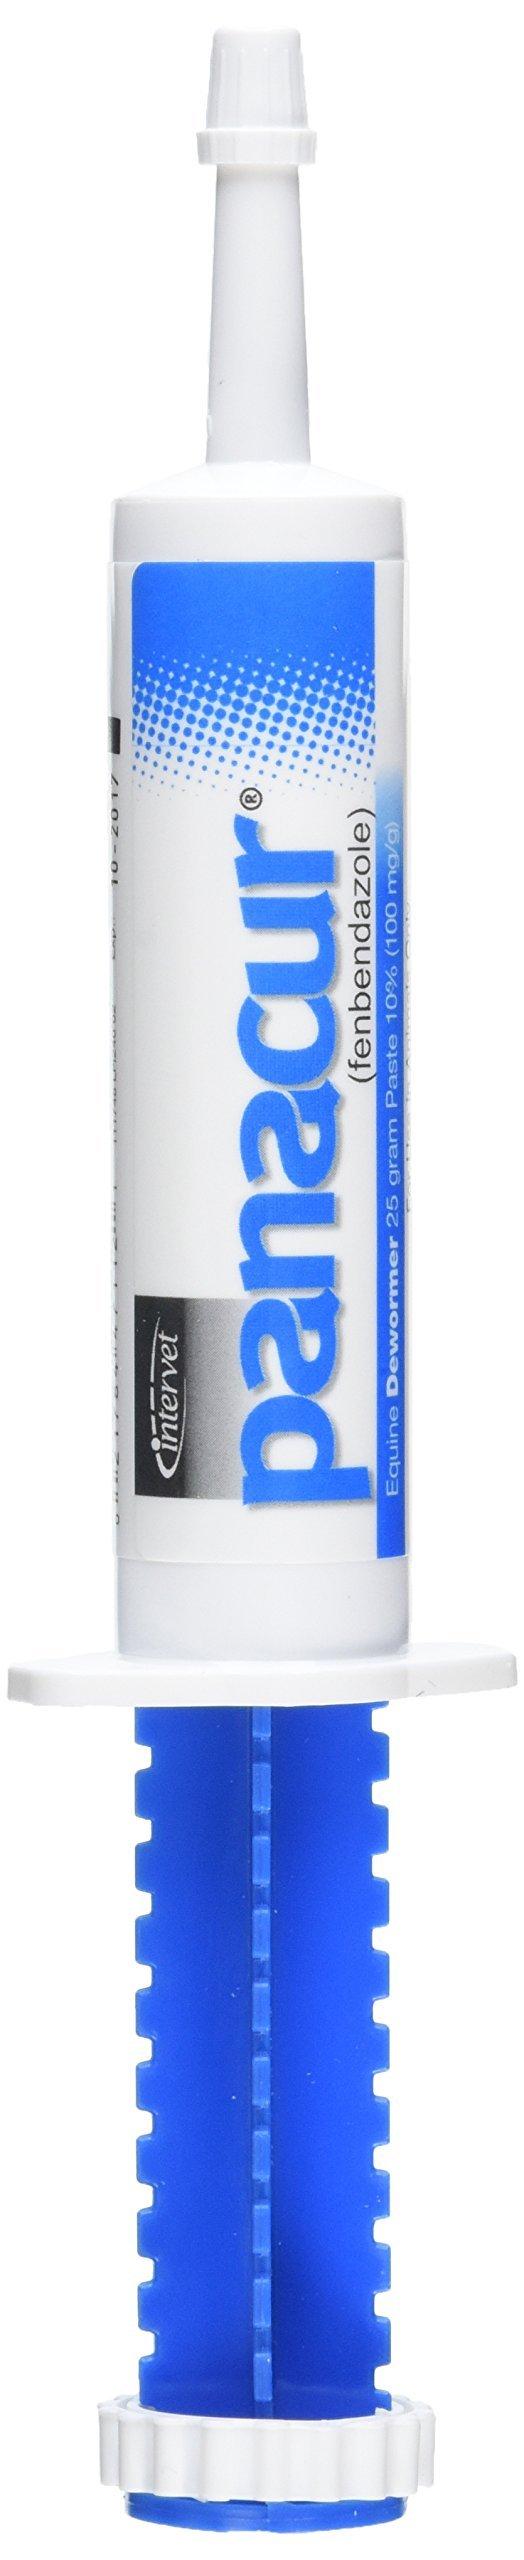 PANACUR DewormerHORSEPASTE10%, 100mg by SCHERING/INTERVET D